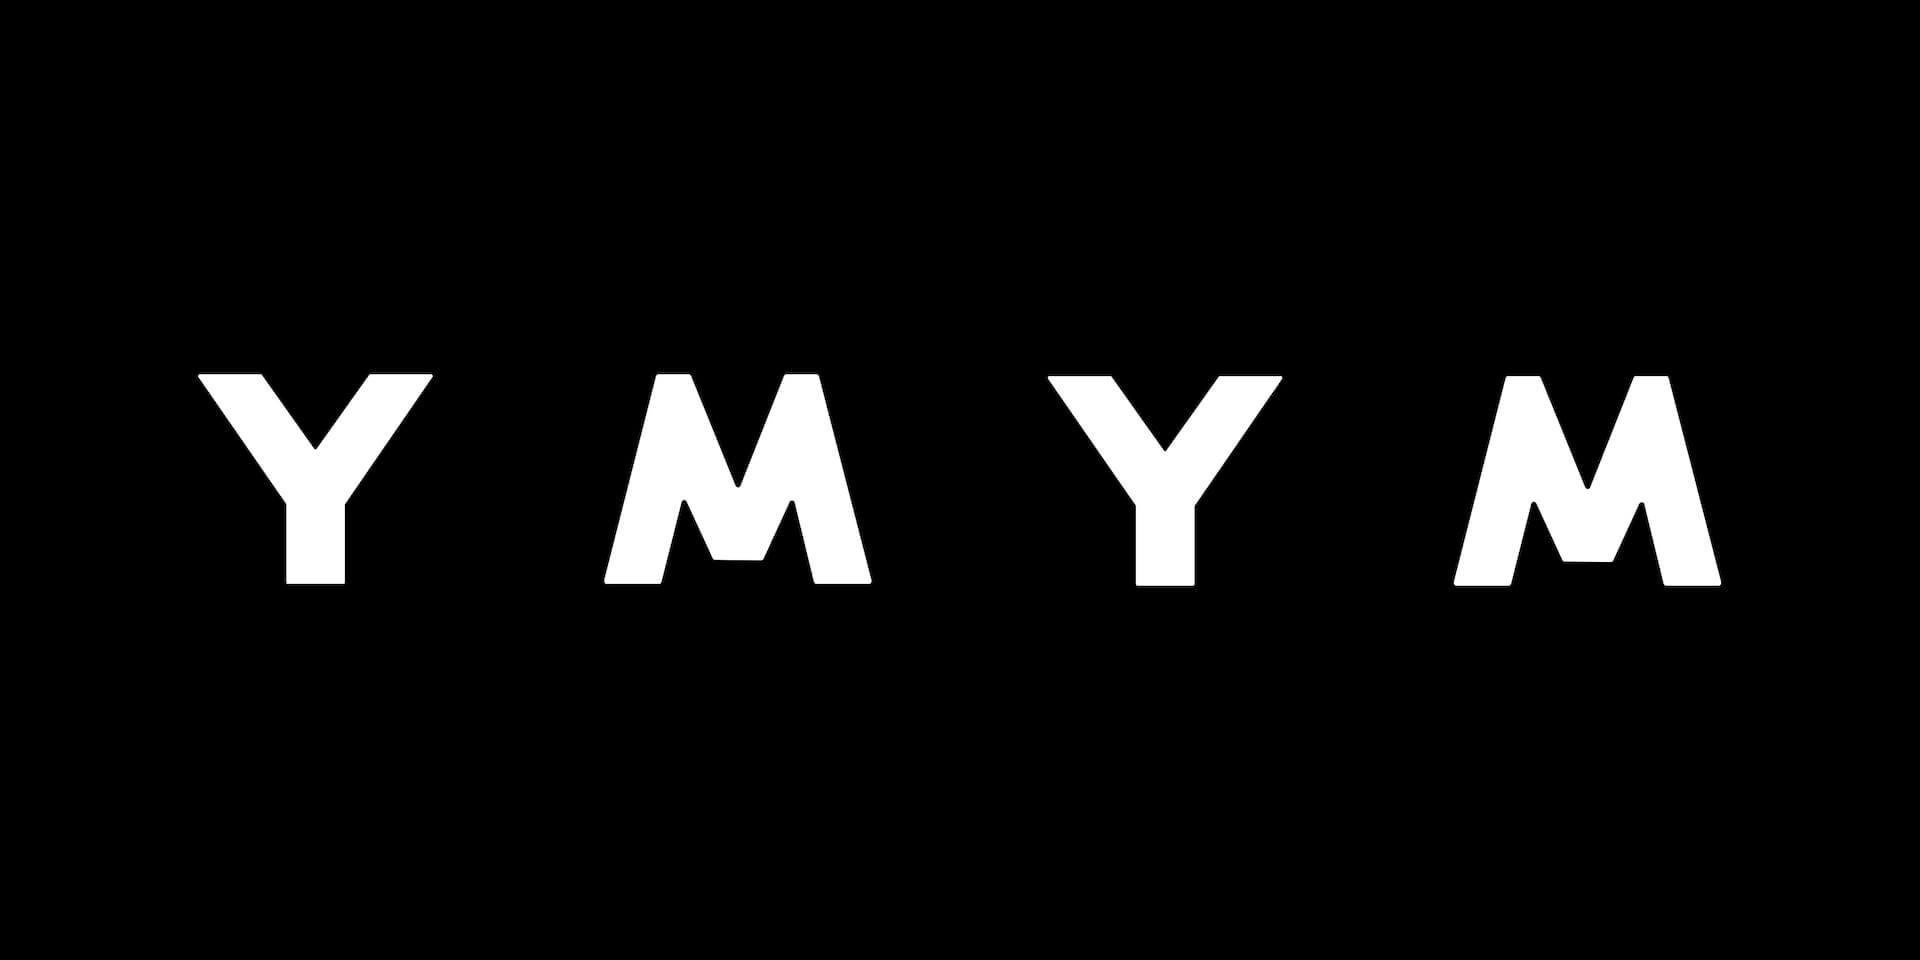 CHAIのベーシスト・YUUKIによるプロジェクト「YMYM」よりファッションブランドオープン!2021年春夏コレクション&描き下ろし絵画などの展示会も life210405_ymym_16